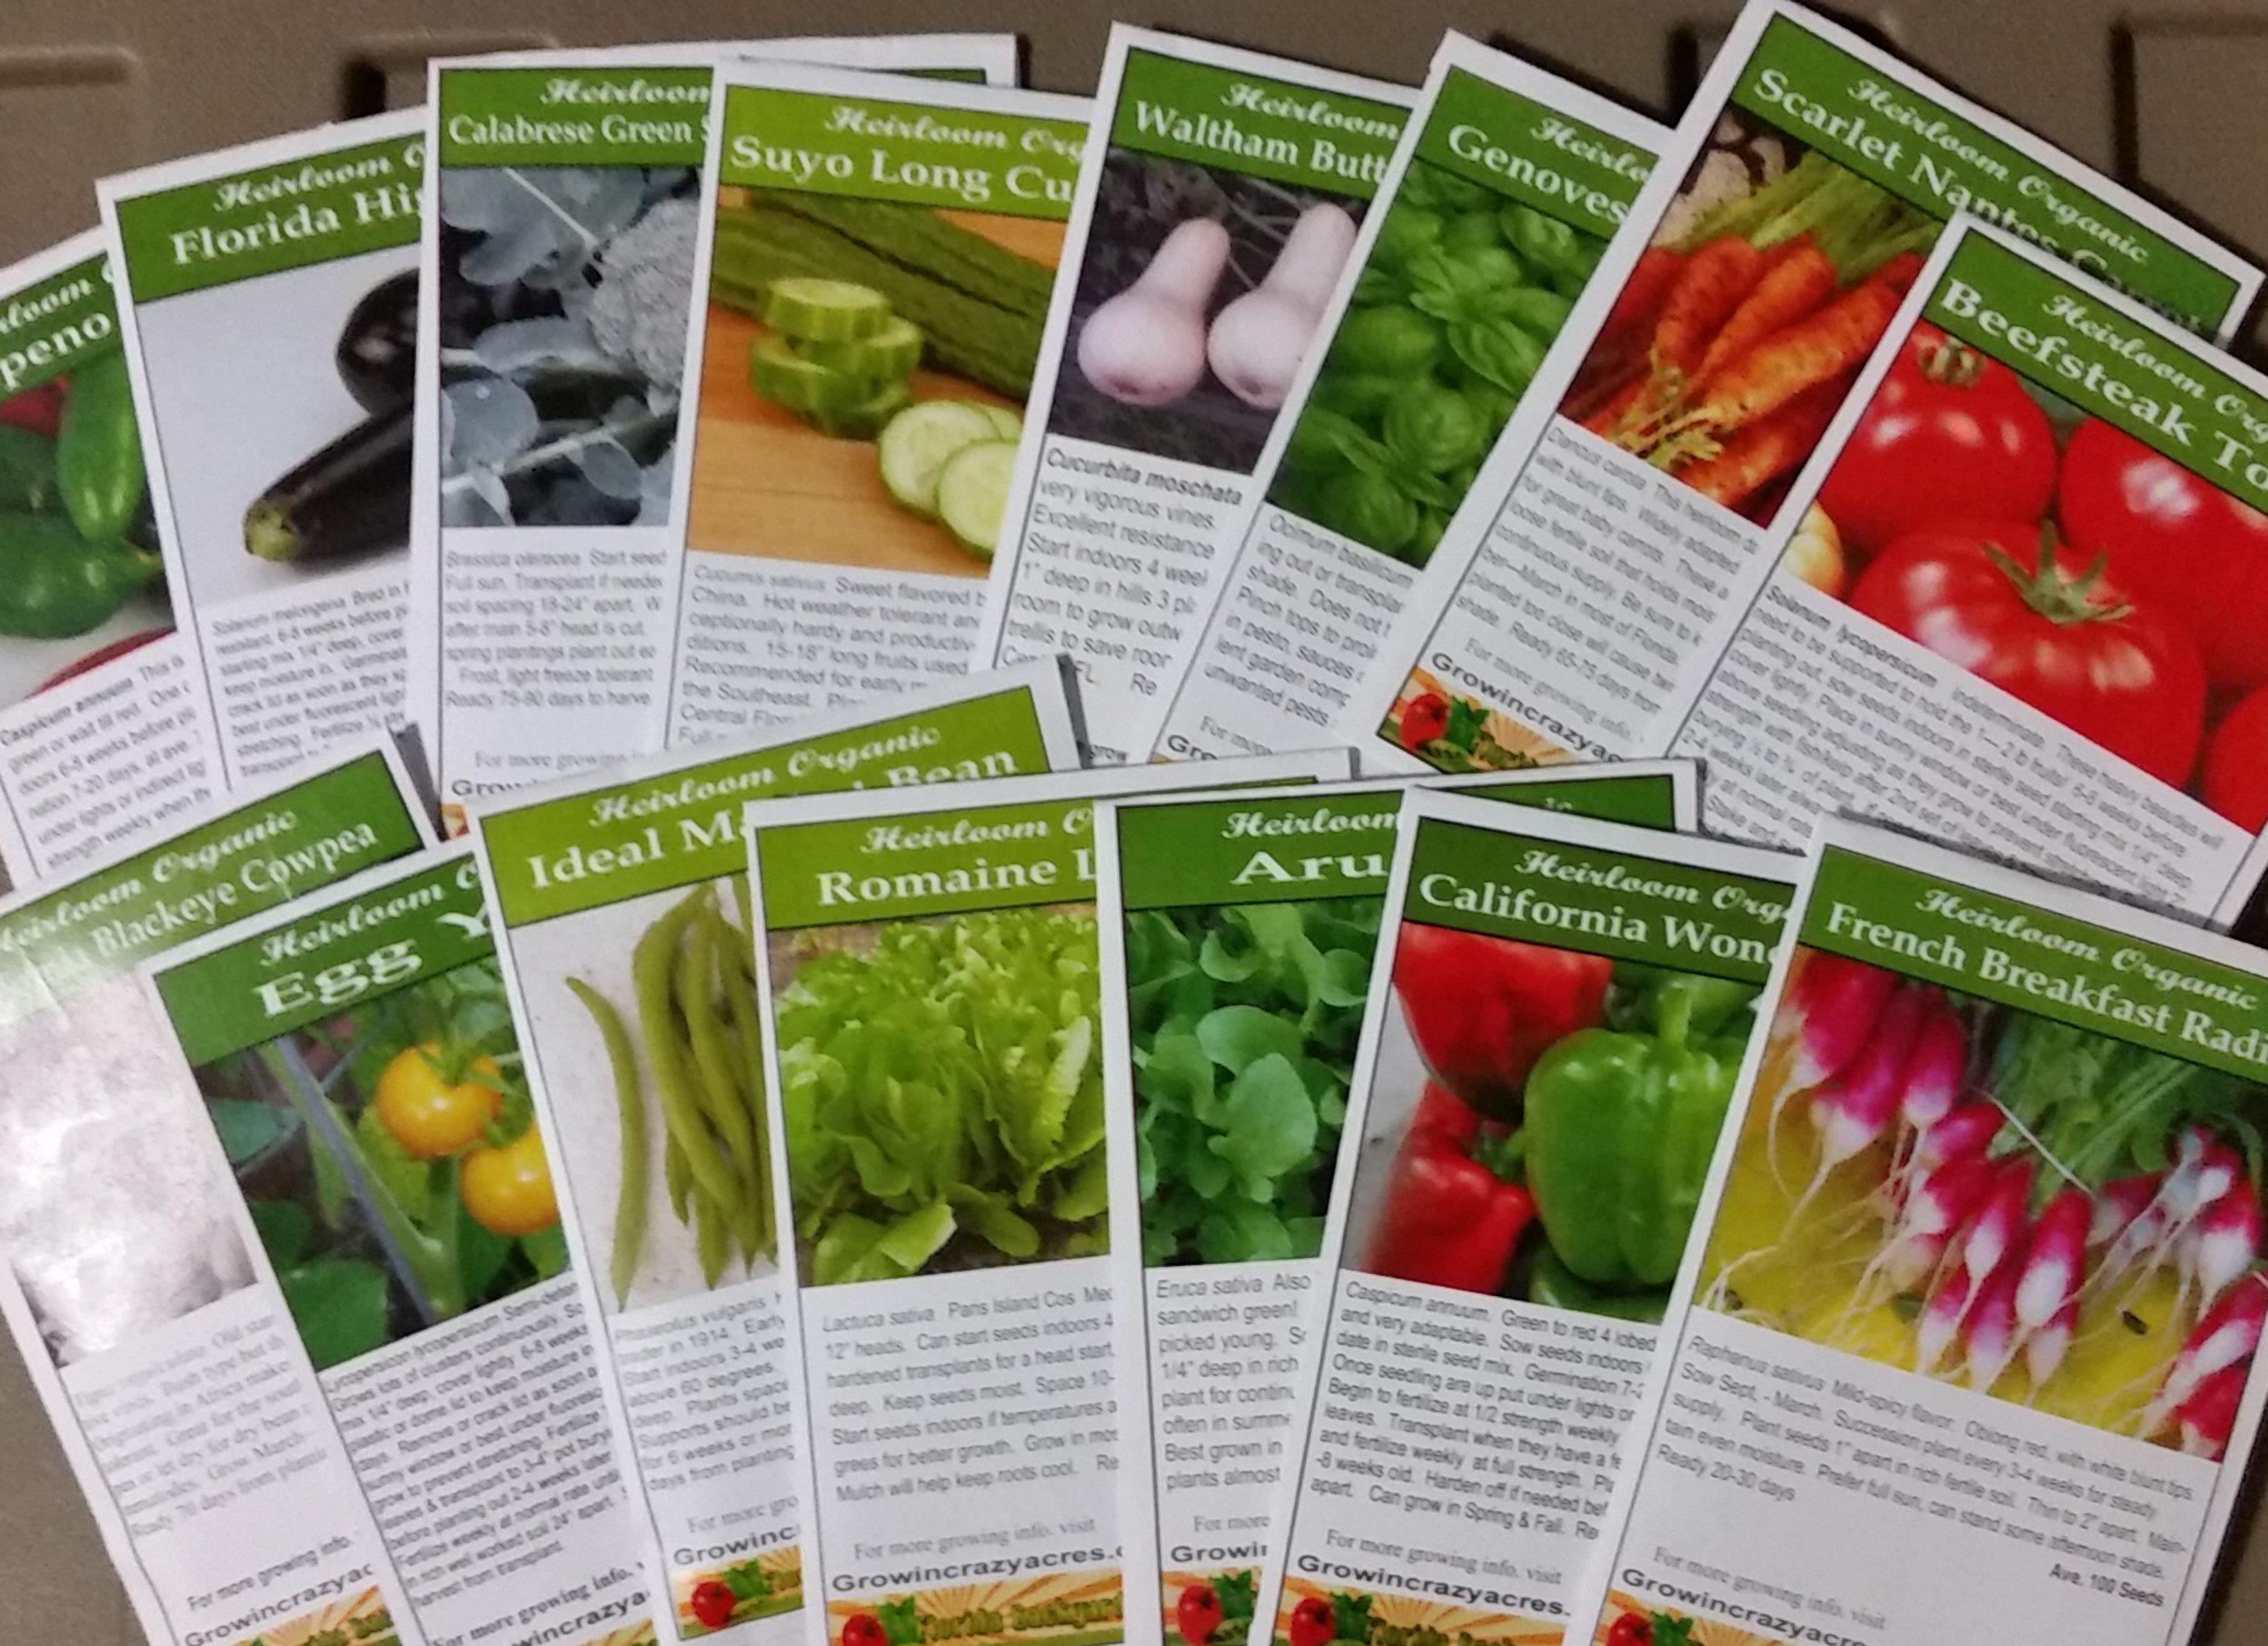 Cornetto di Bordeaux Seeds 500 Endive Escarole Heirloom 2020 Seeds